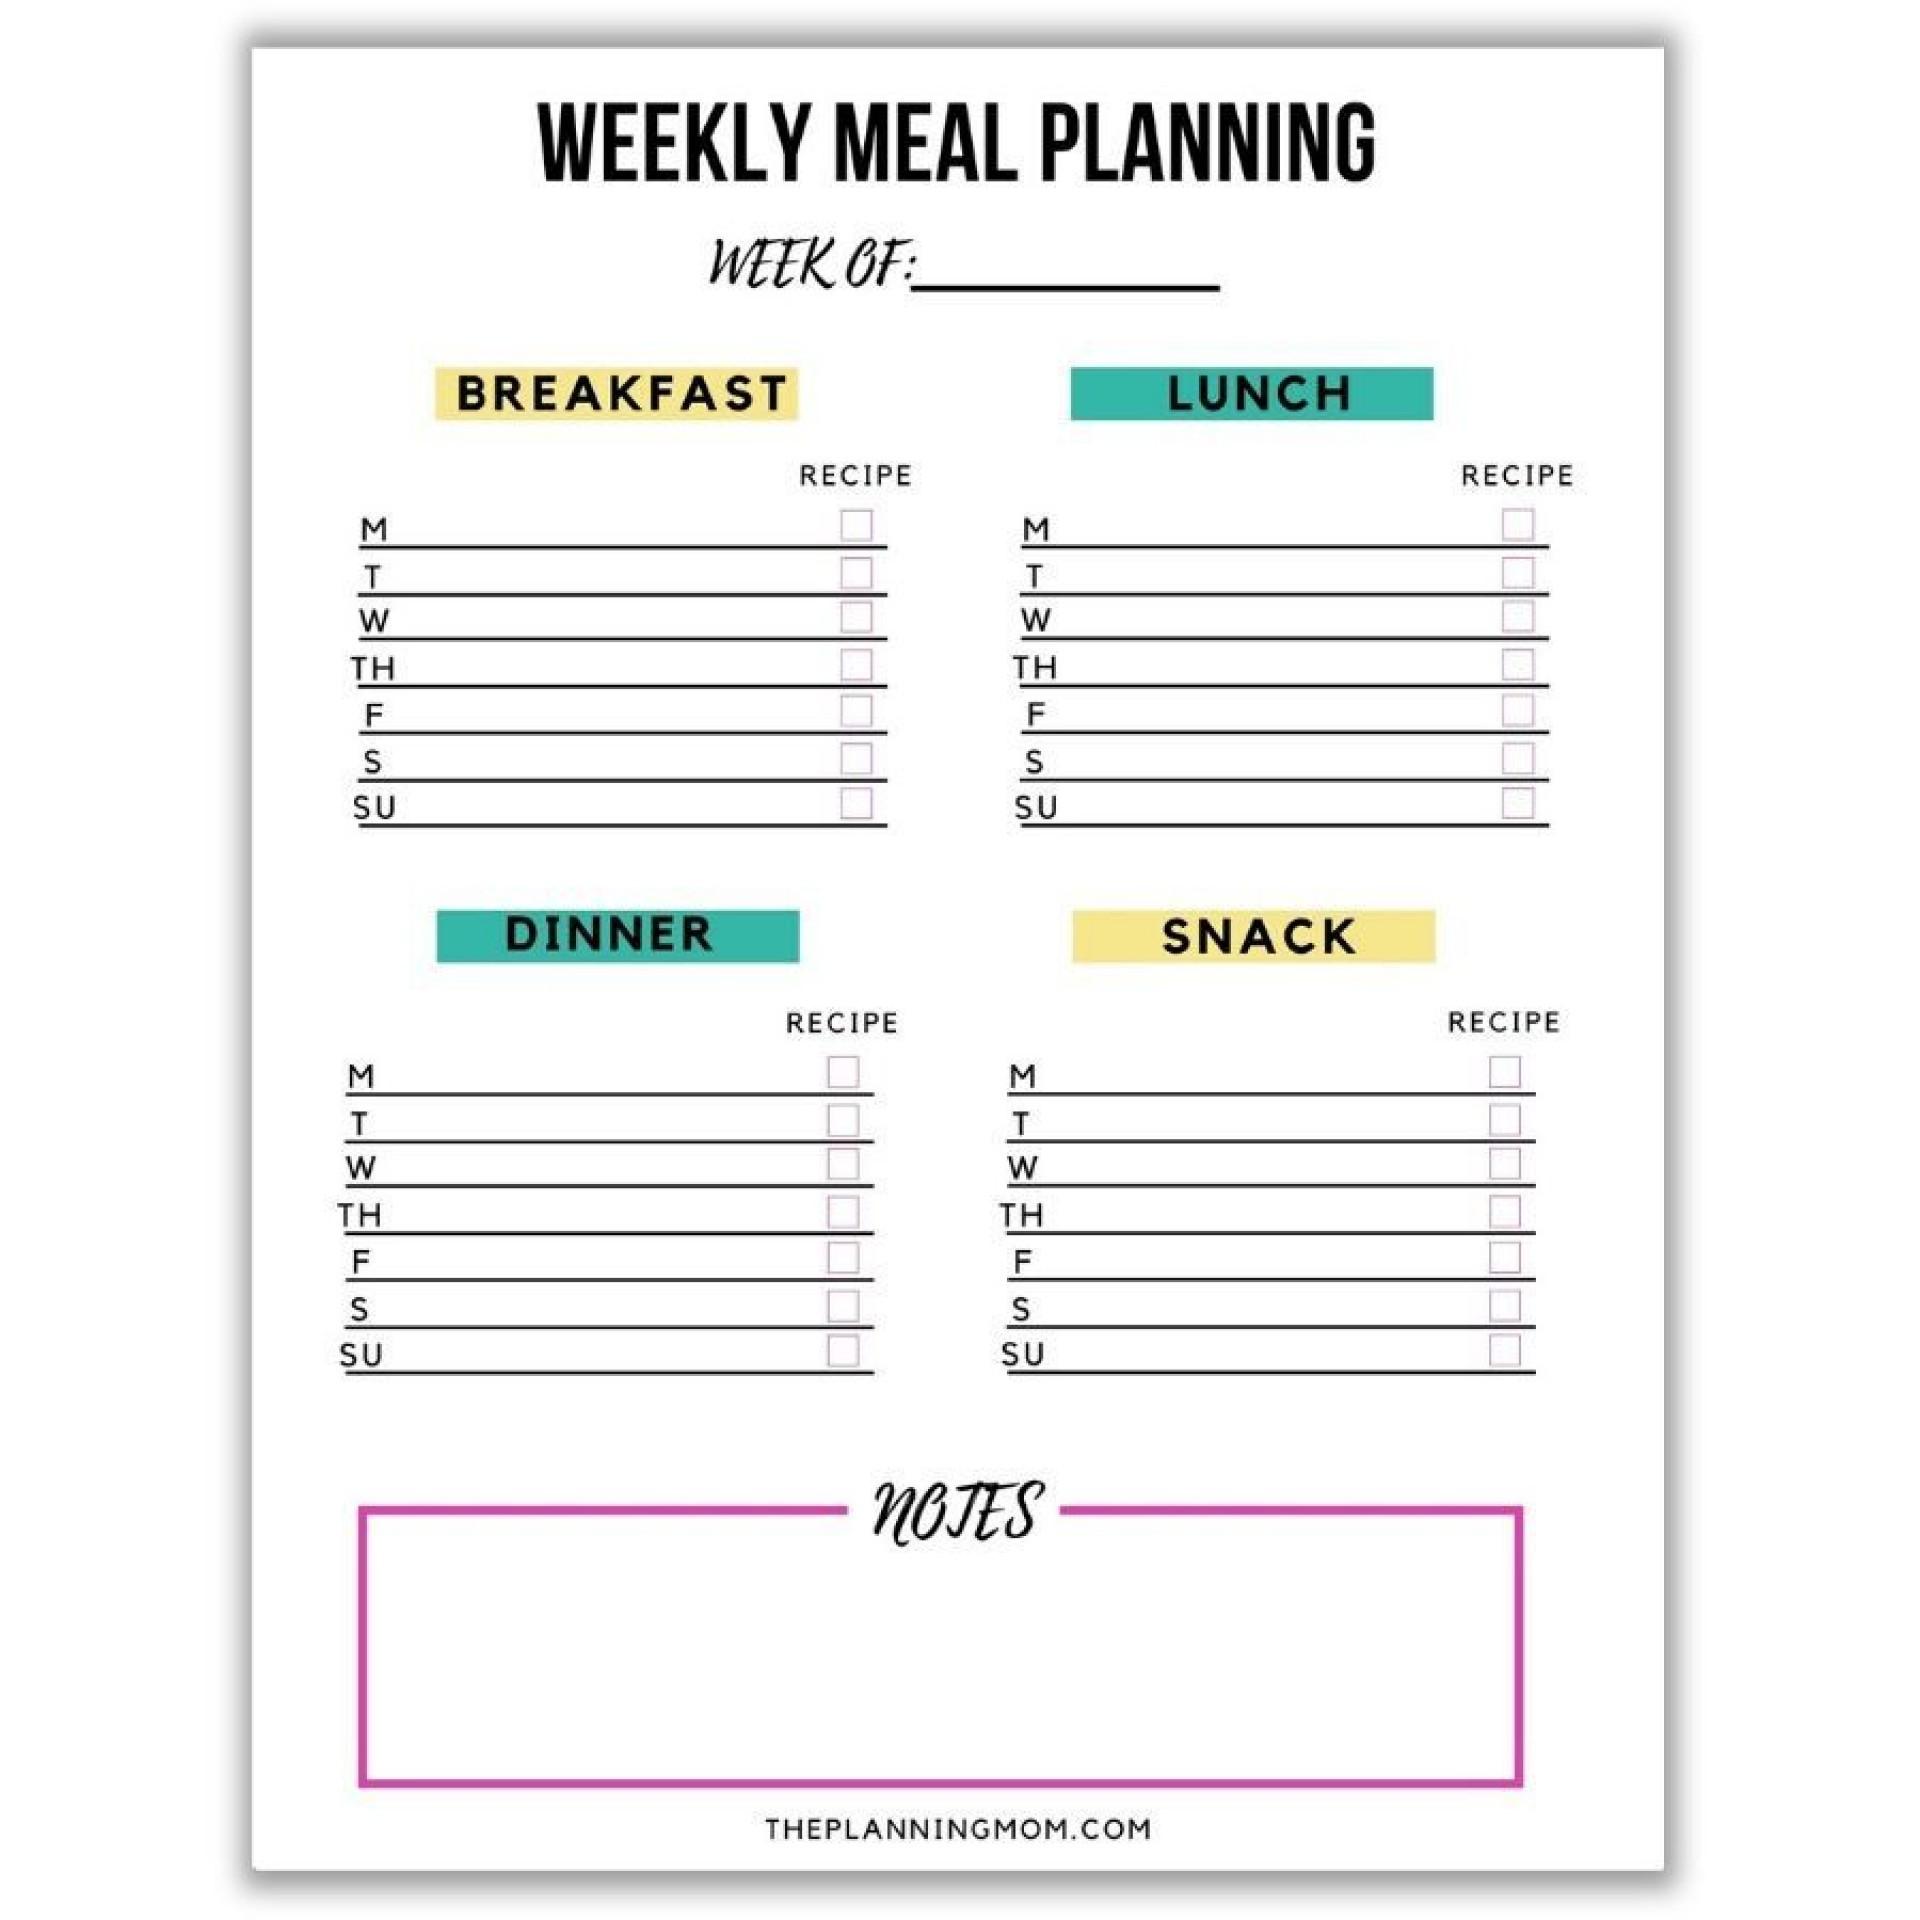 006 Unique Free Printable Weekly Meal Plan Template Image  Planning Worksheet1920